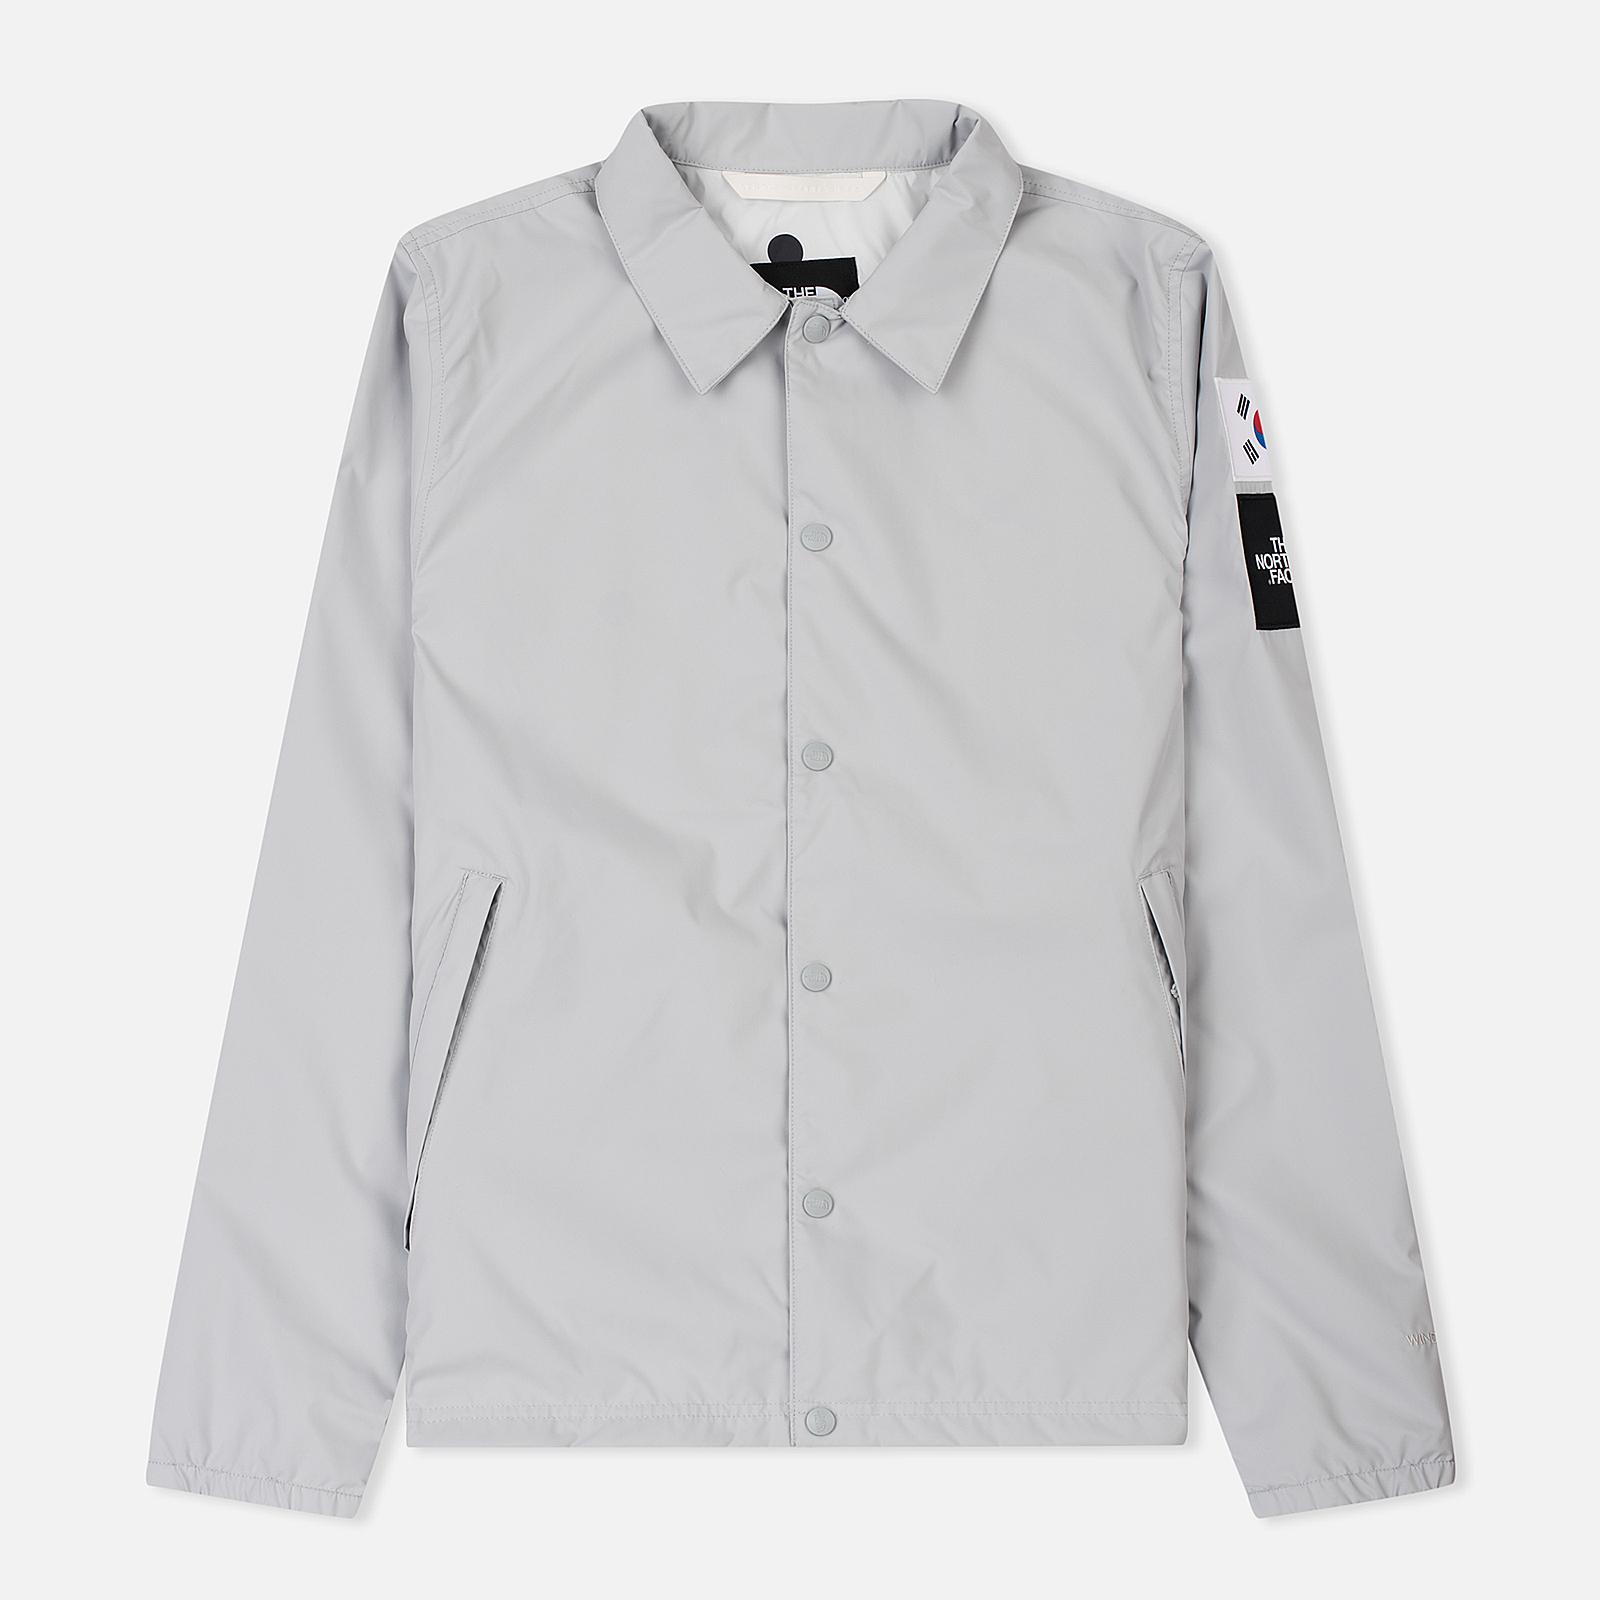 6e0ee9628c1b The North FaceМужская куртка IC Coaches High Rise Grey